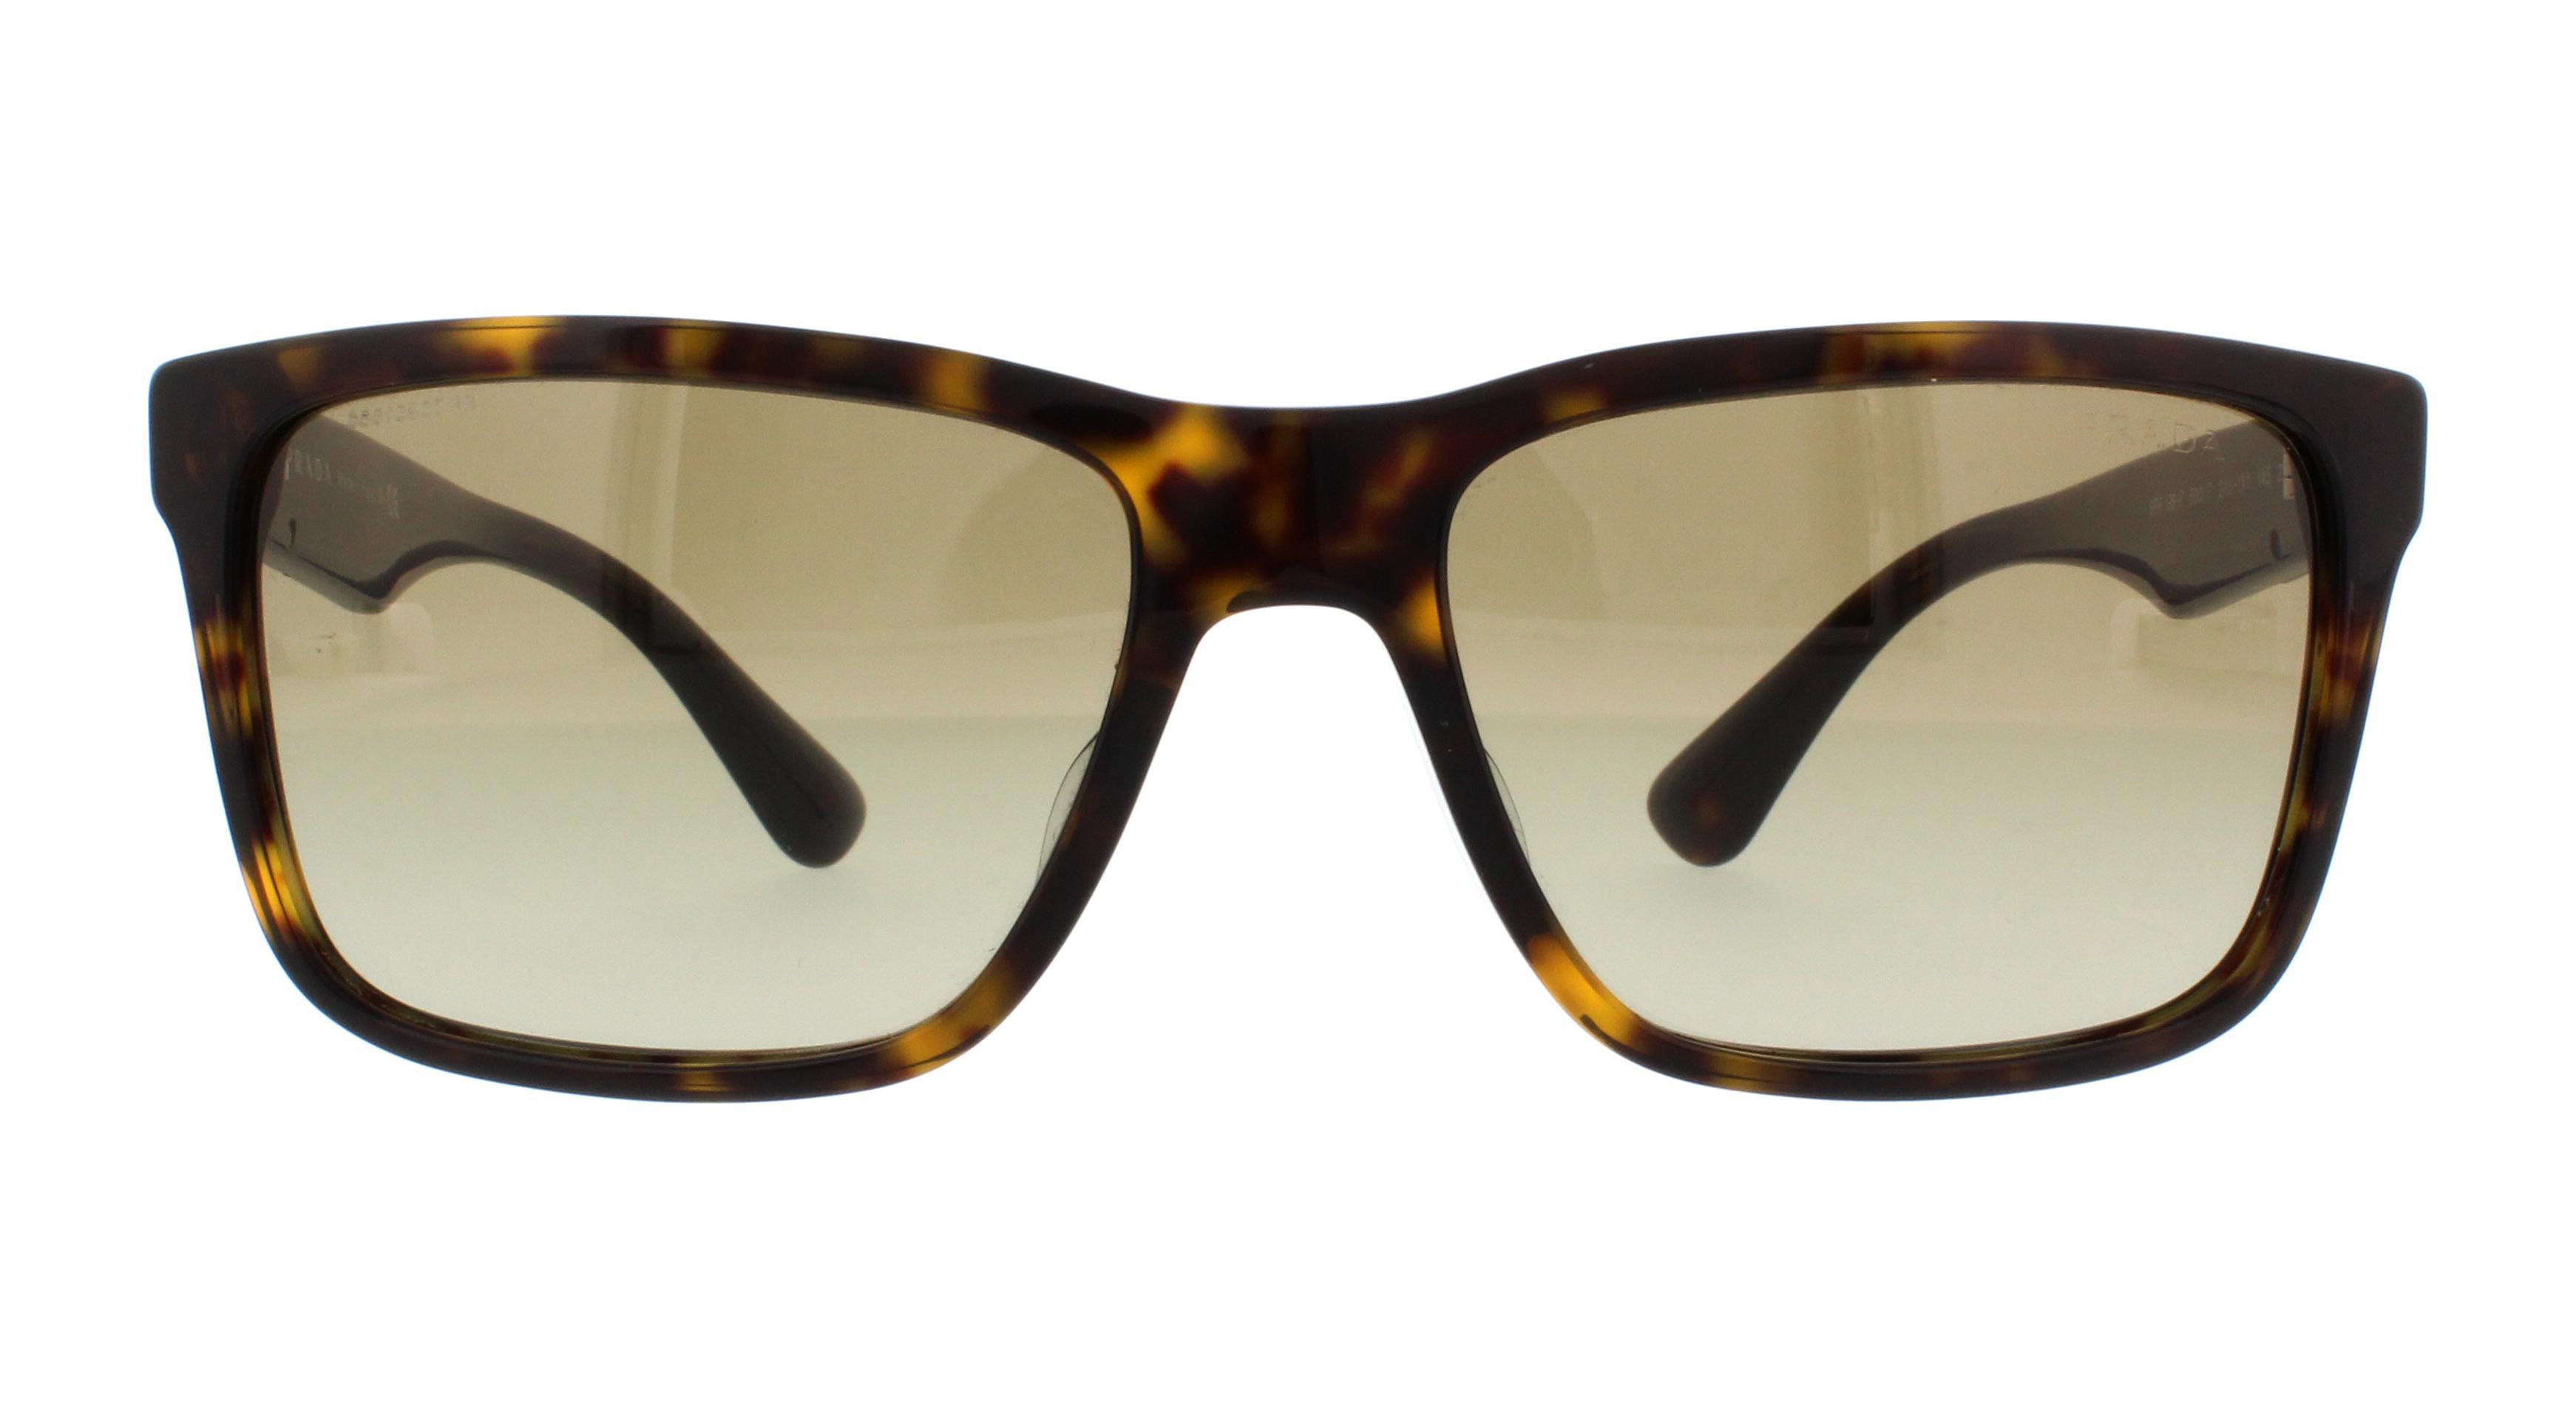 6671edcc322 ... best price prada sunglasses pr19ssf 2au1x1 havana 59mm 2ef22 4747d  denmark prada sunglasses pr ...